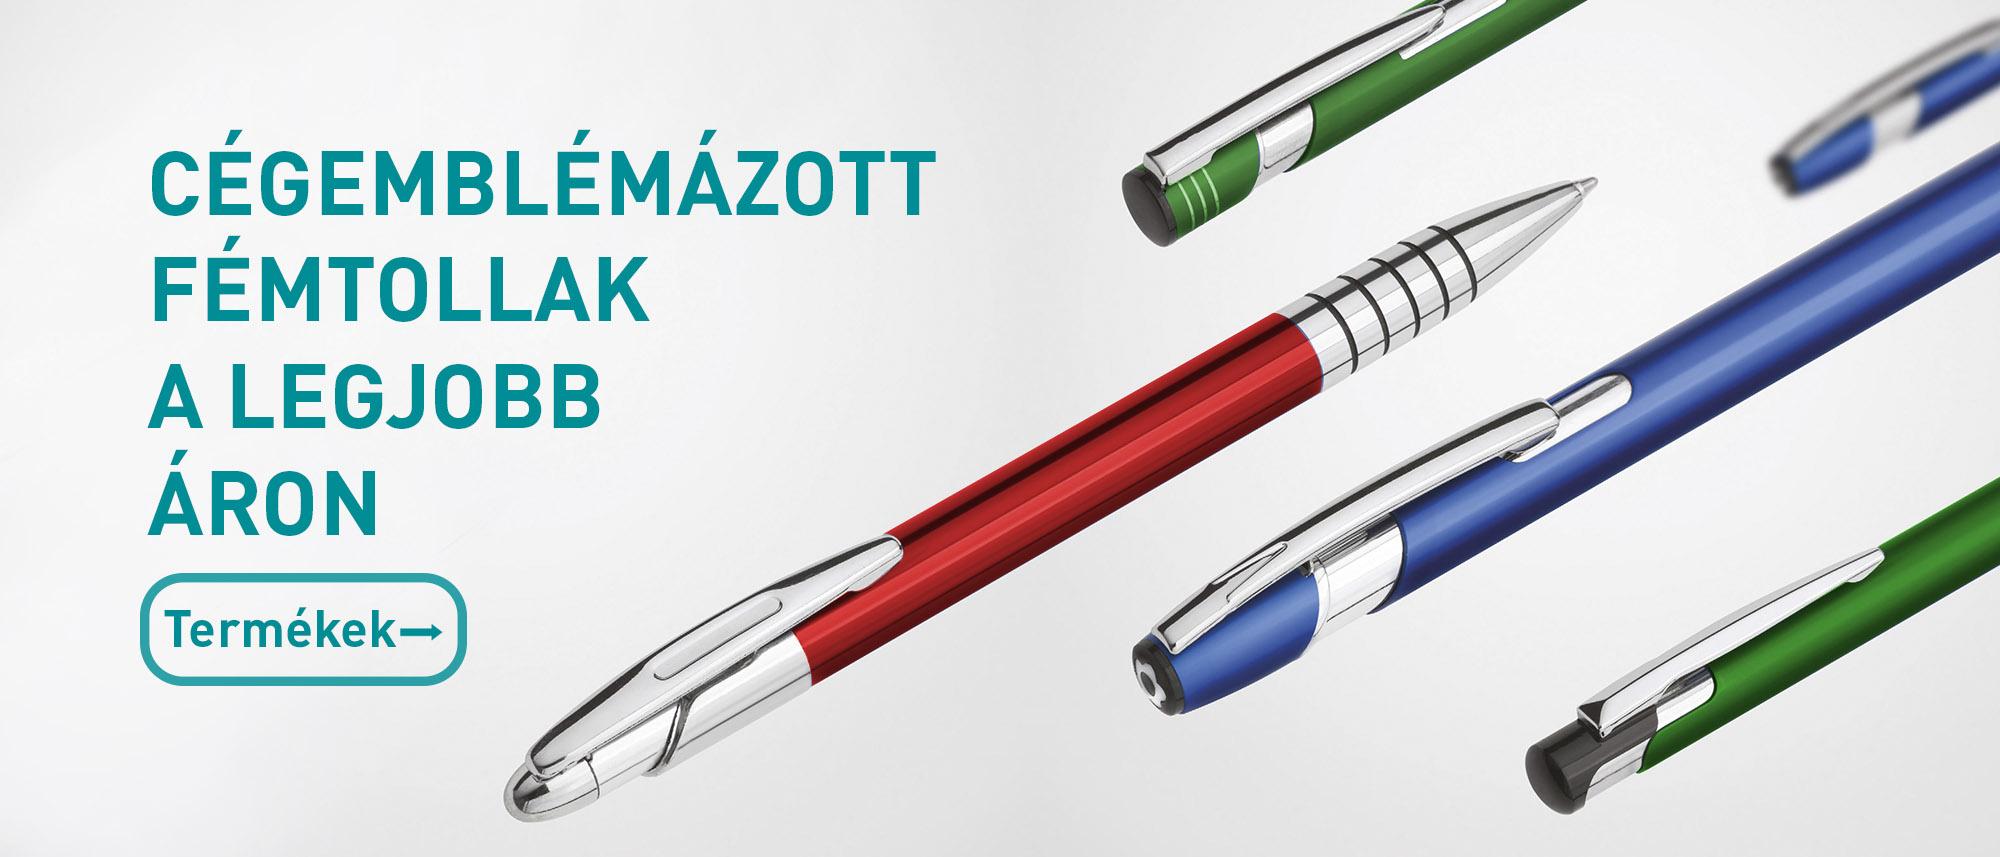 Céges fém tollak